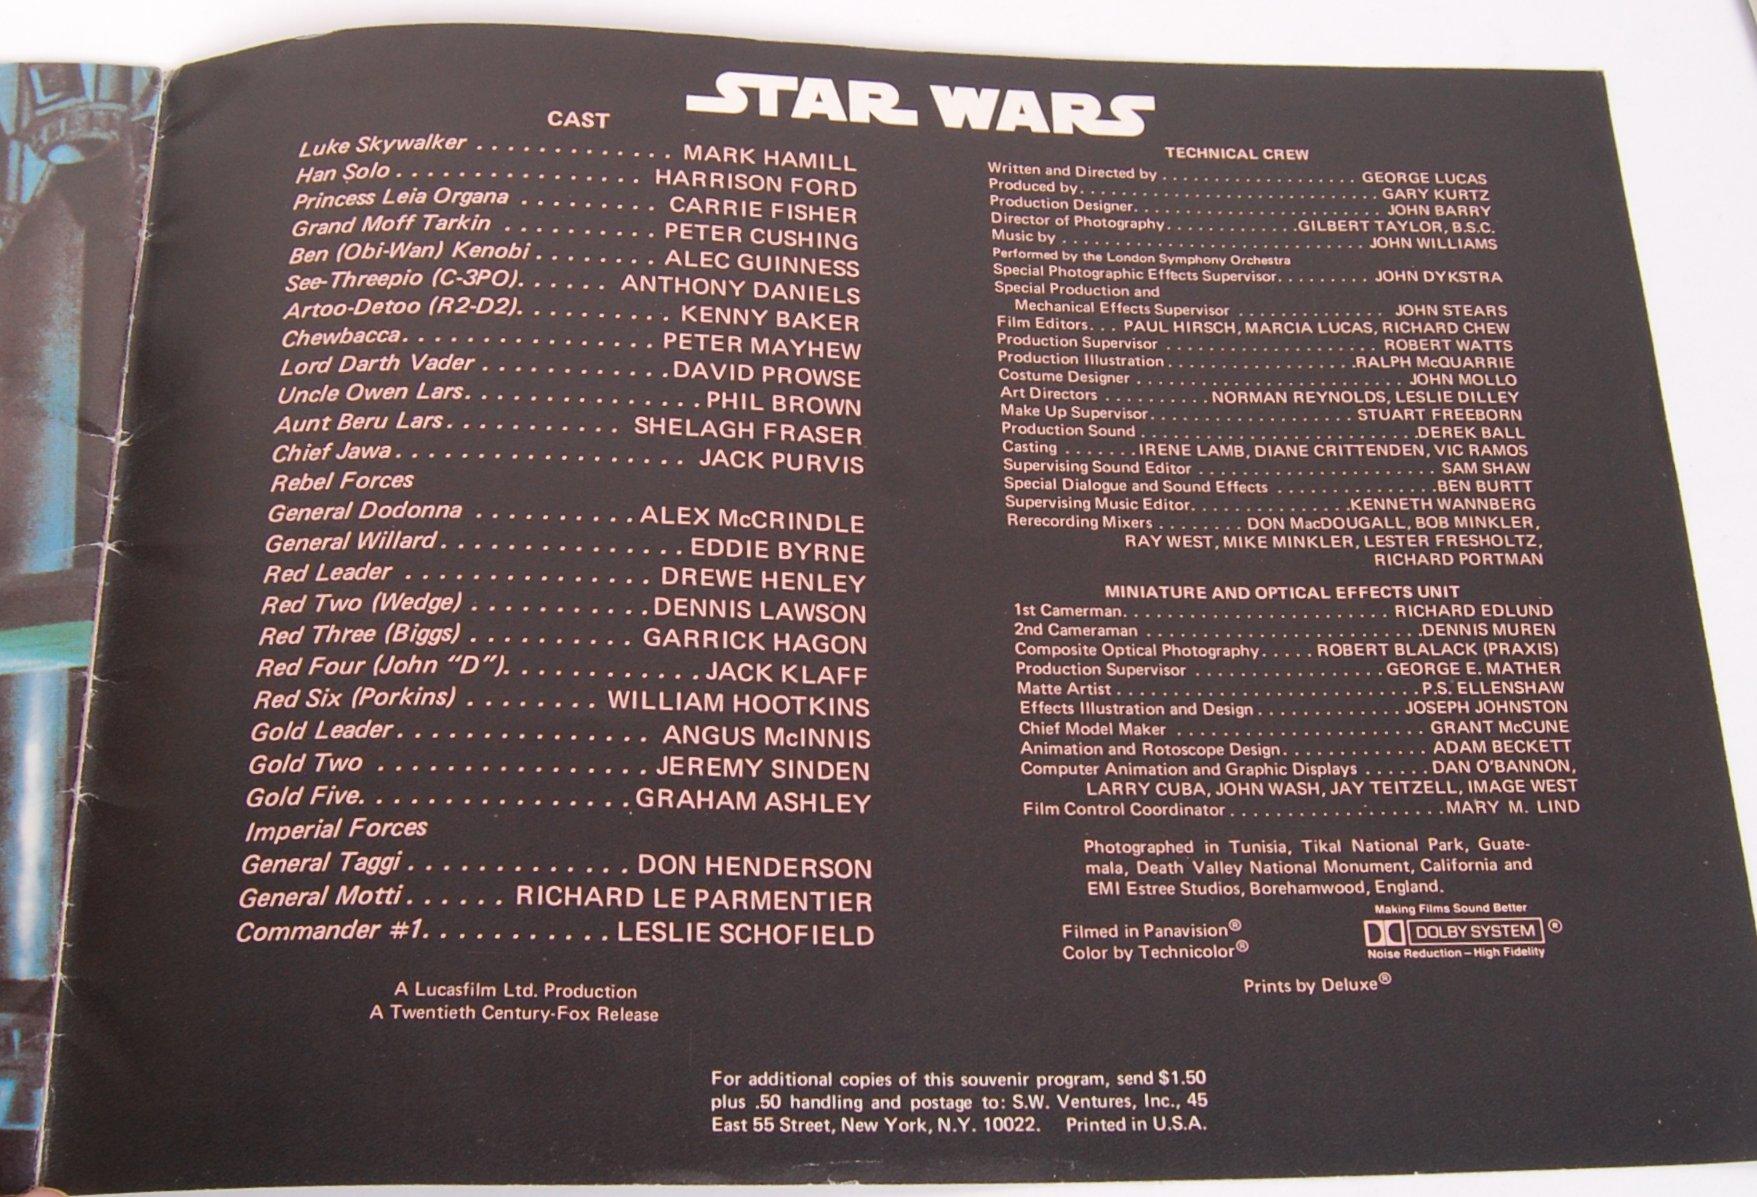 RARE ORIGINAL 1977 STAR WARS UK CINEMA RELEASE BRO - Image 4 of 4